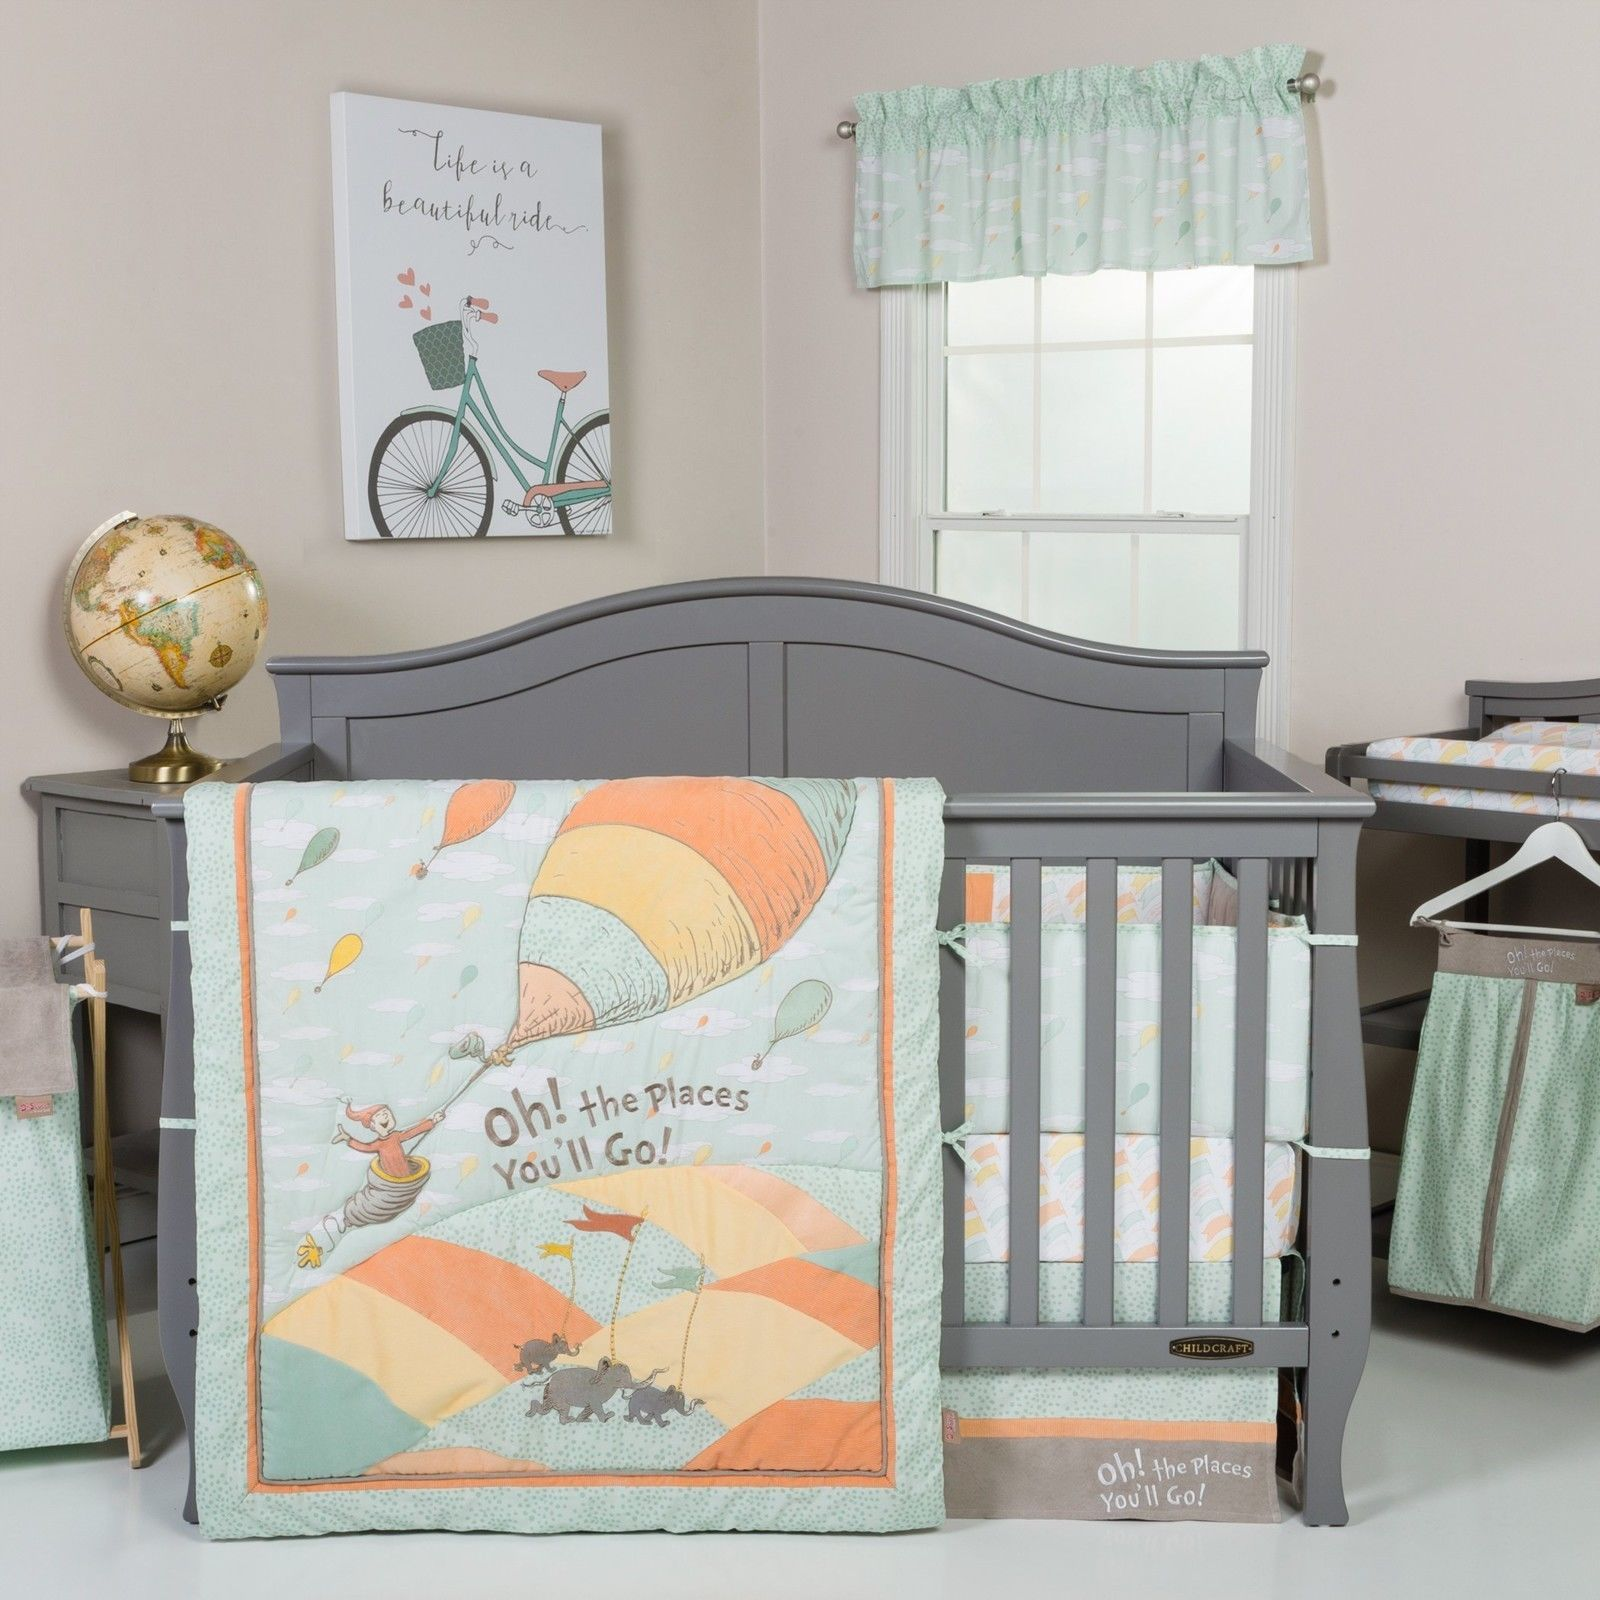 Nursery Toddler Crib Bedding Set Excellent Quality Reversible Unisex 5 Pieces Baby Crib Bedding Sets Baby Crib Bedding Crib Bedding Sets